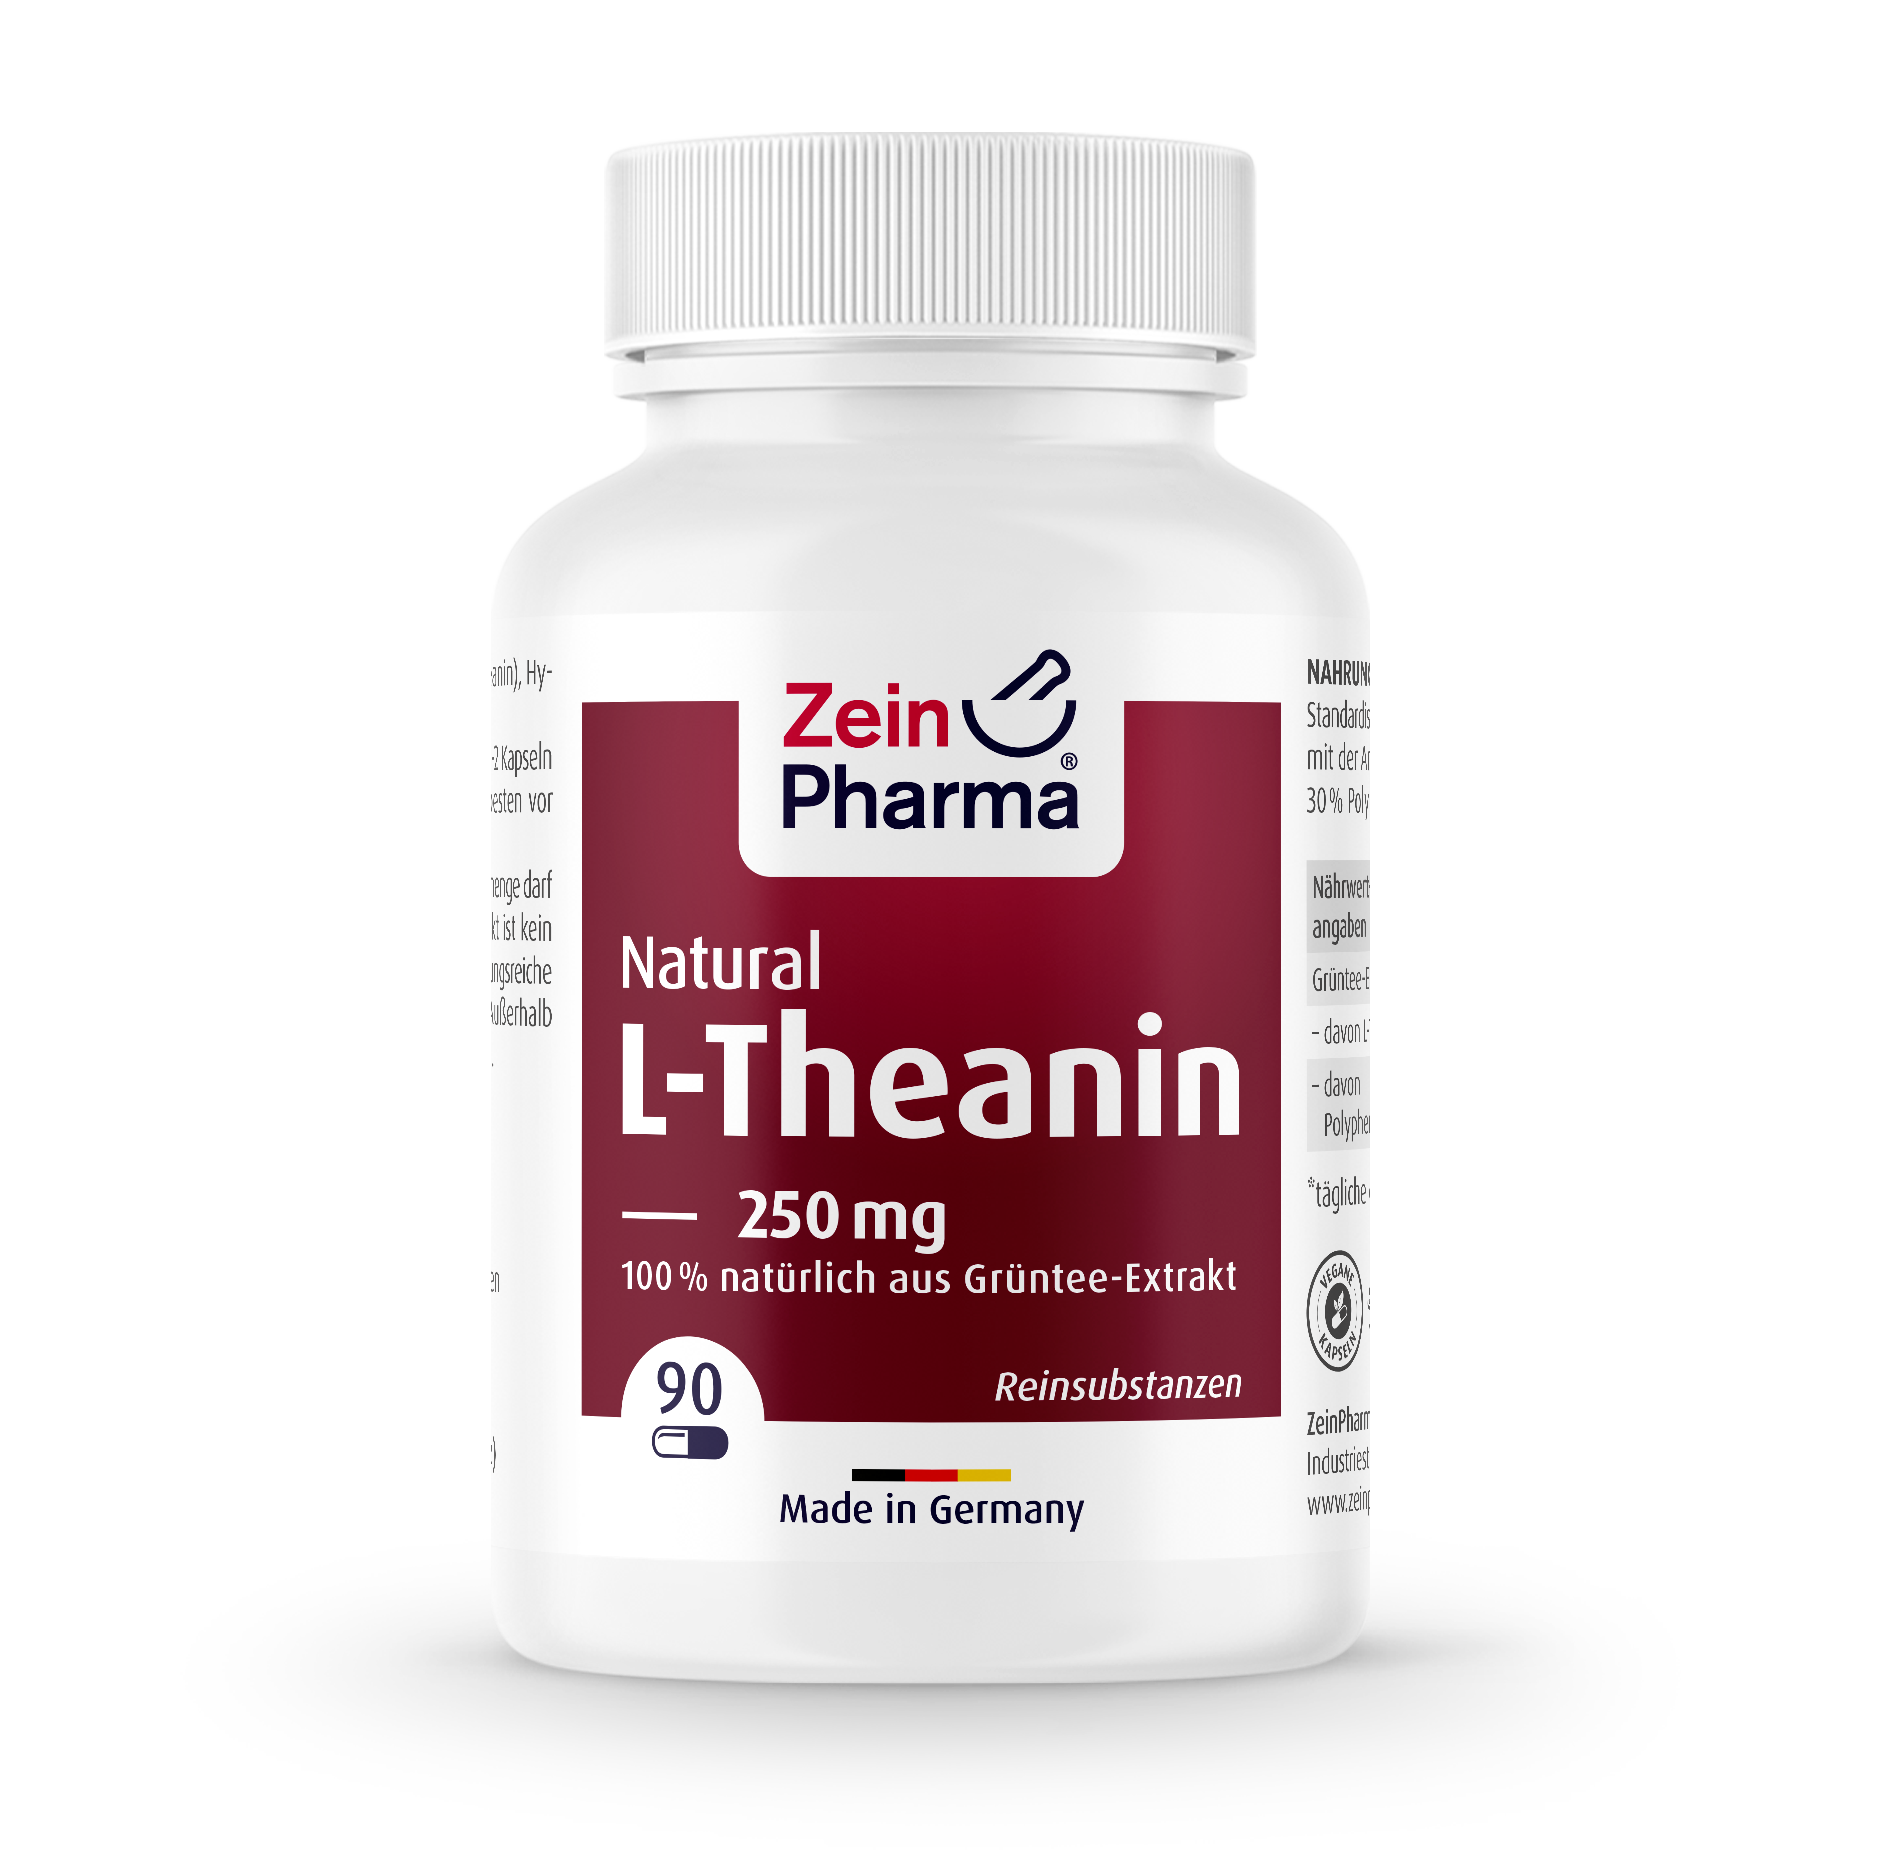 L-Theanin Natural Kapseln 250 mg